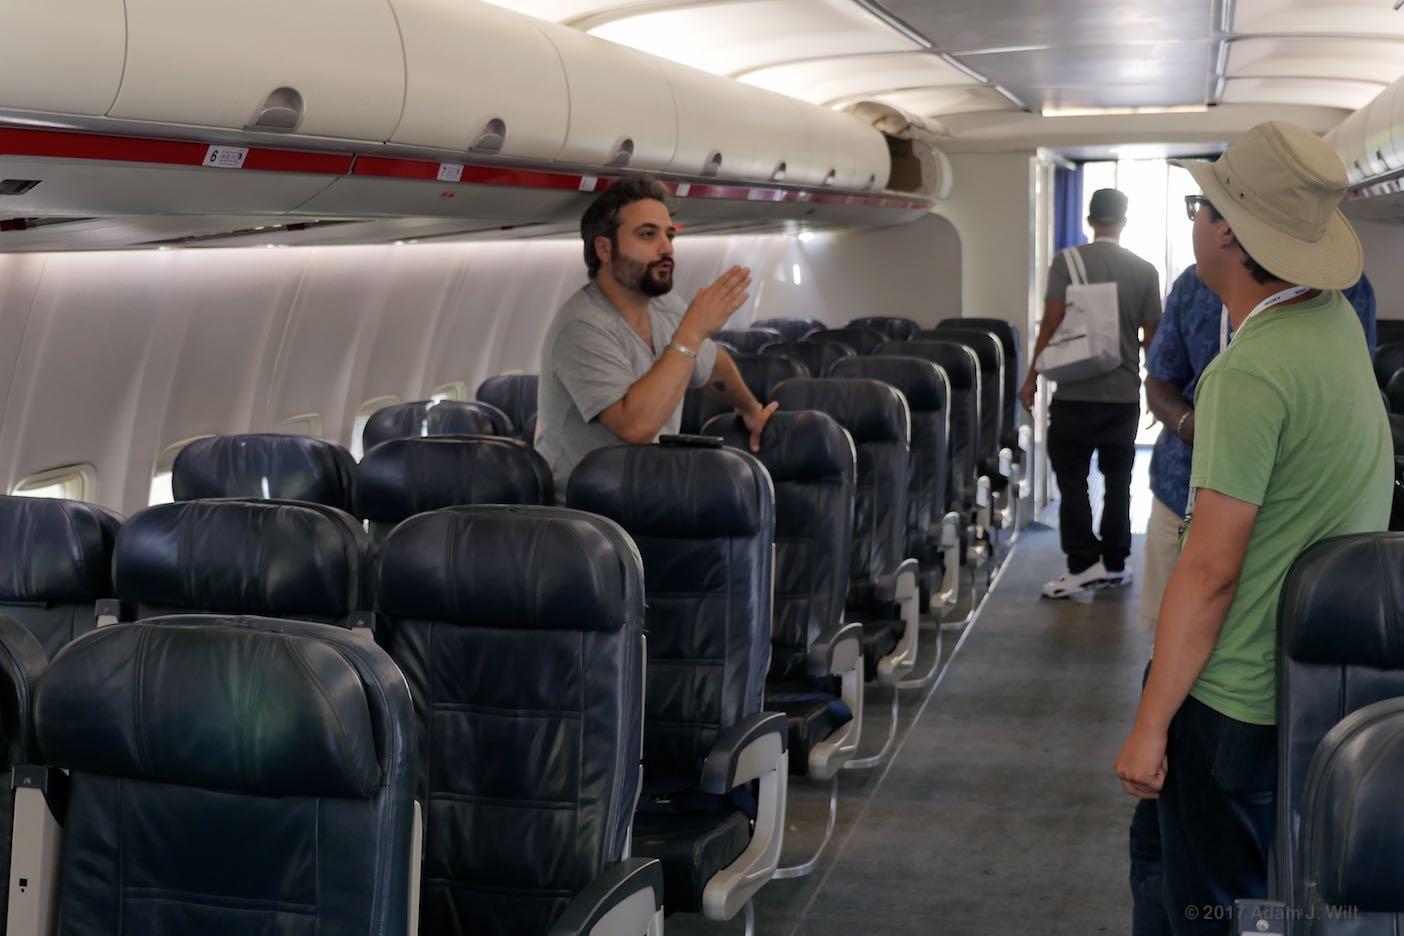 AirHollywood aircraft cabin